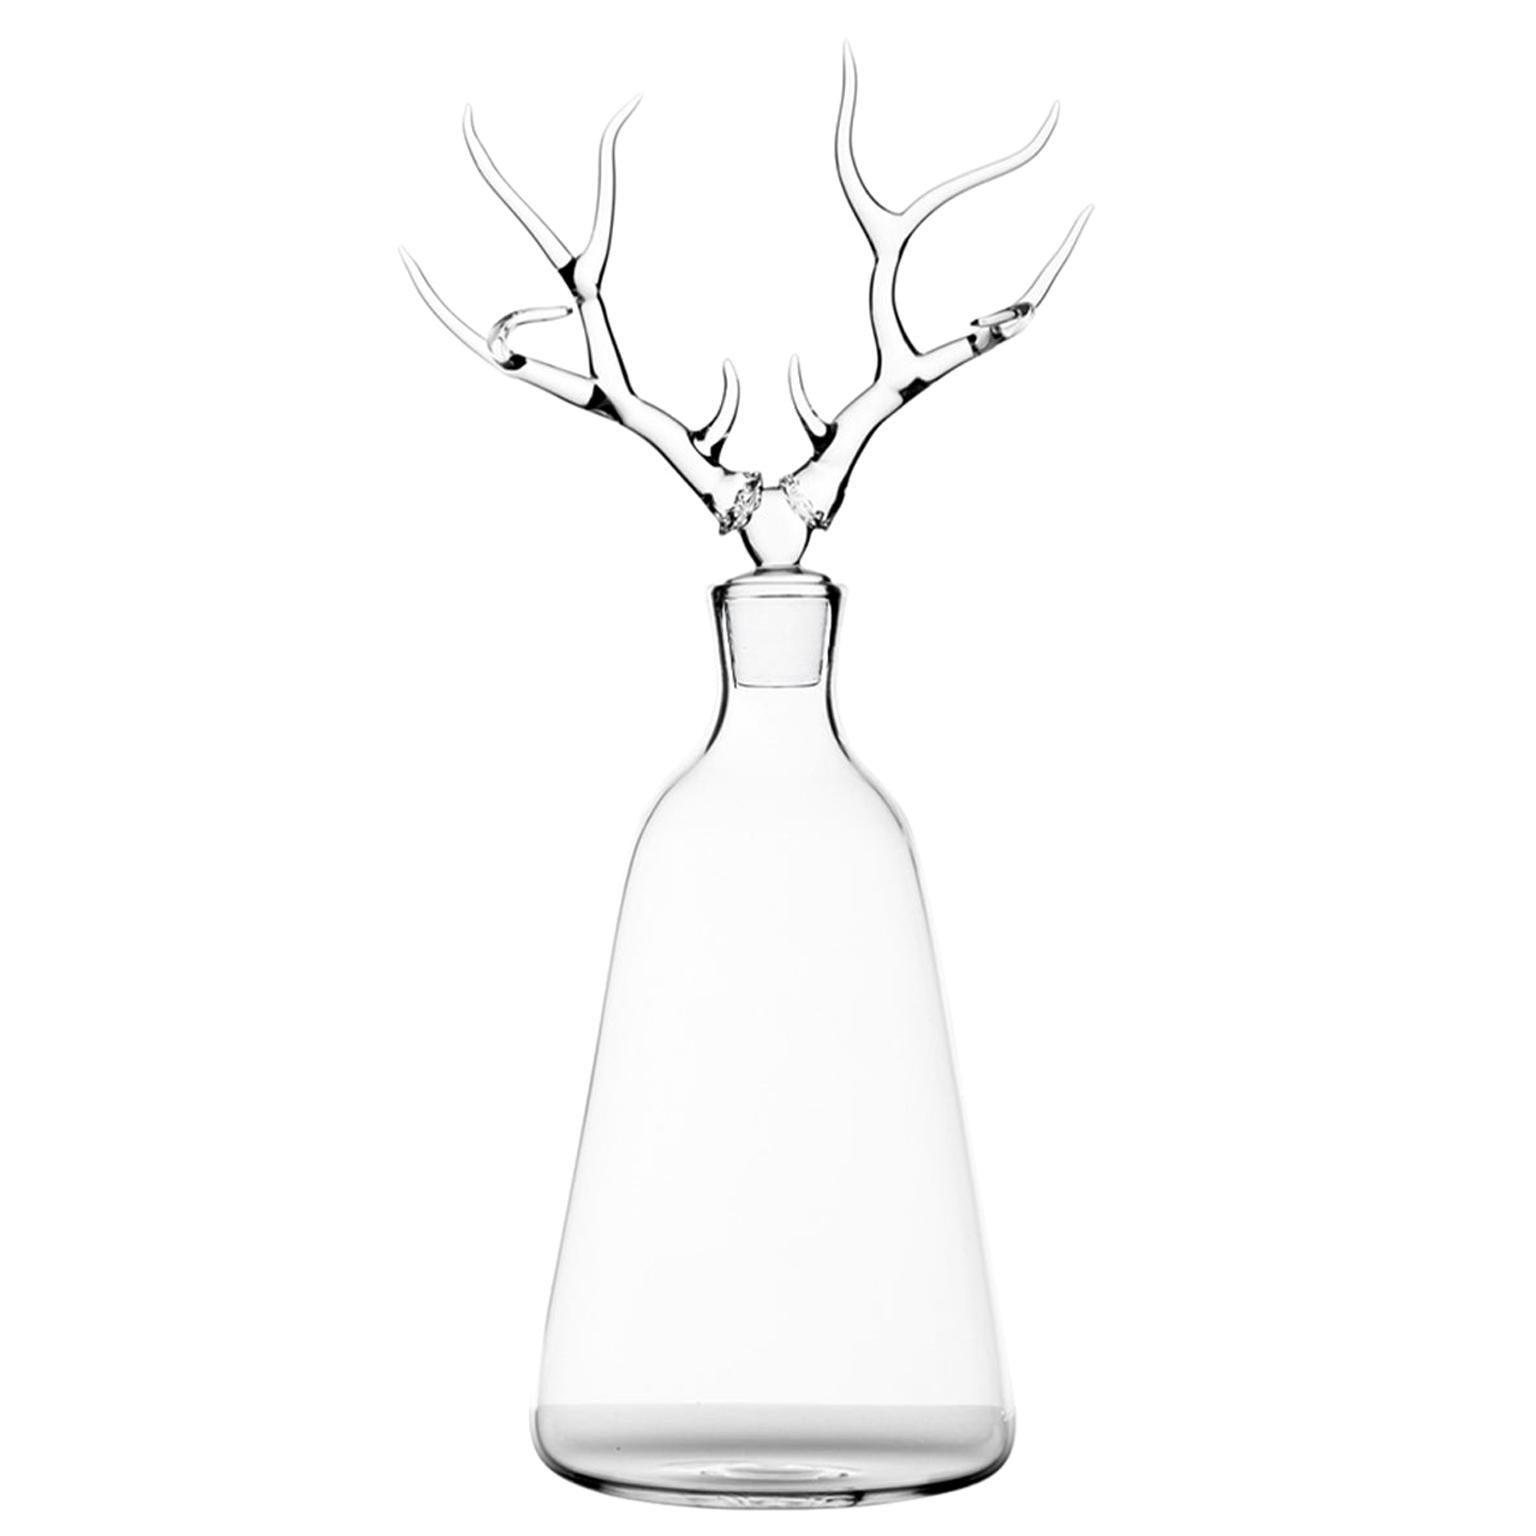 'Deer' Hand Blown Glass Bottle from Trophy Bottles by Simone Crestani